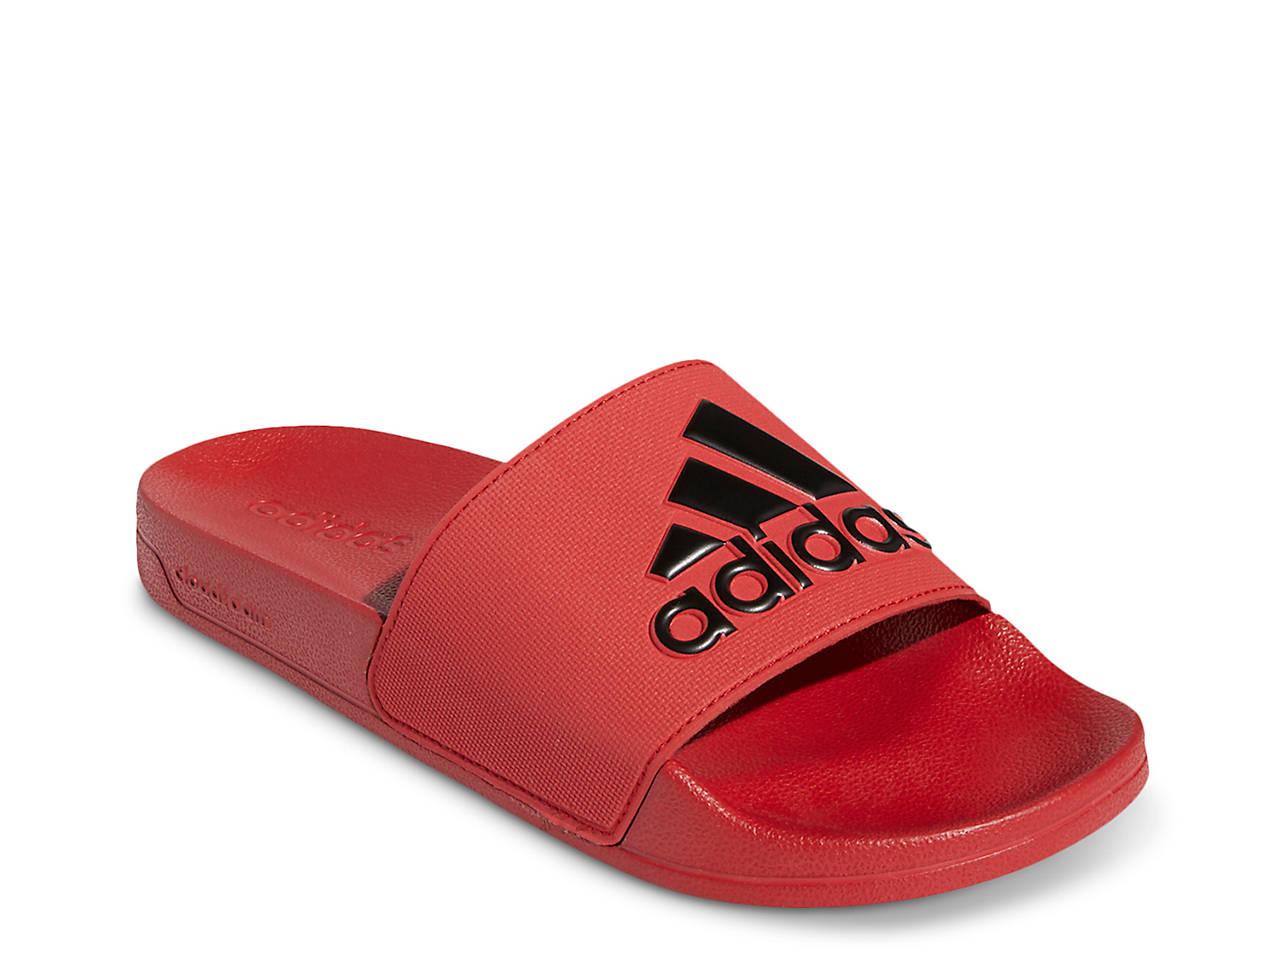 adidas adilette slides dsw